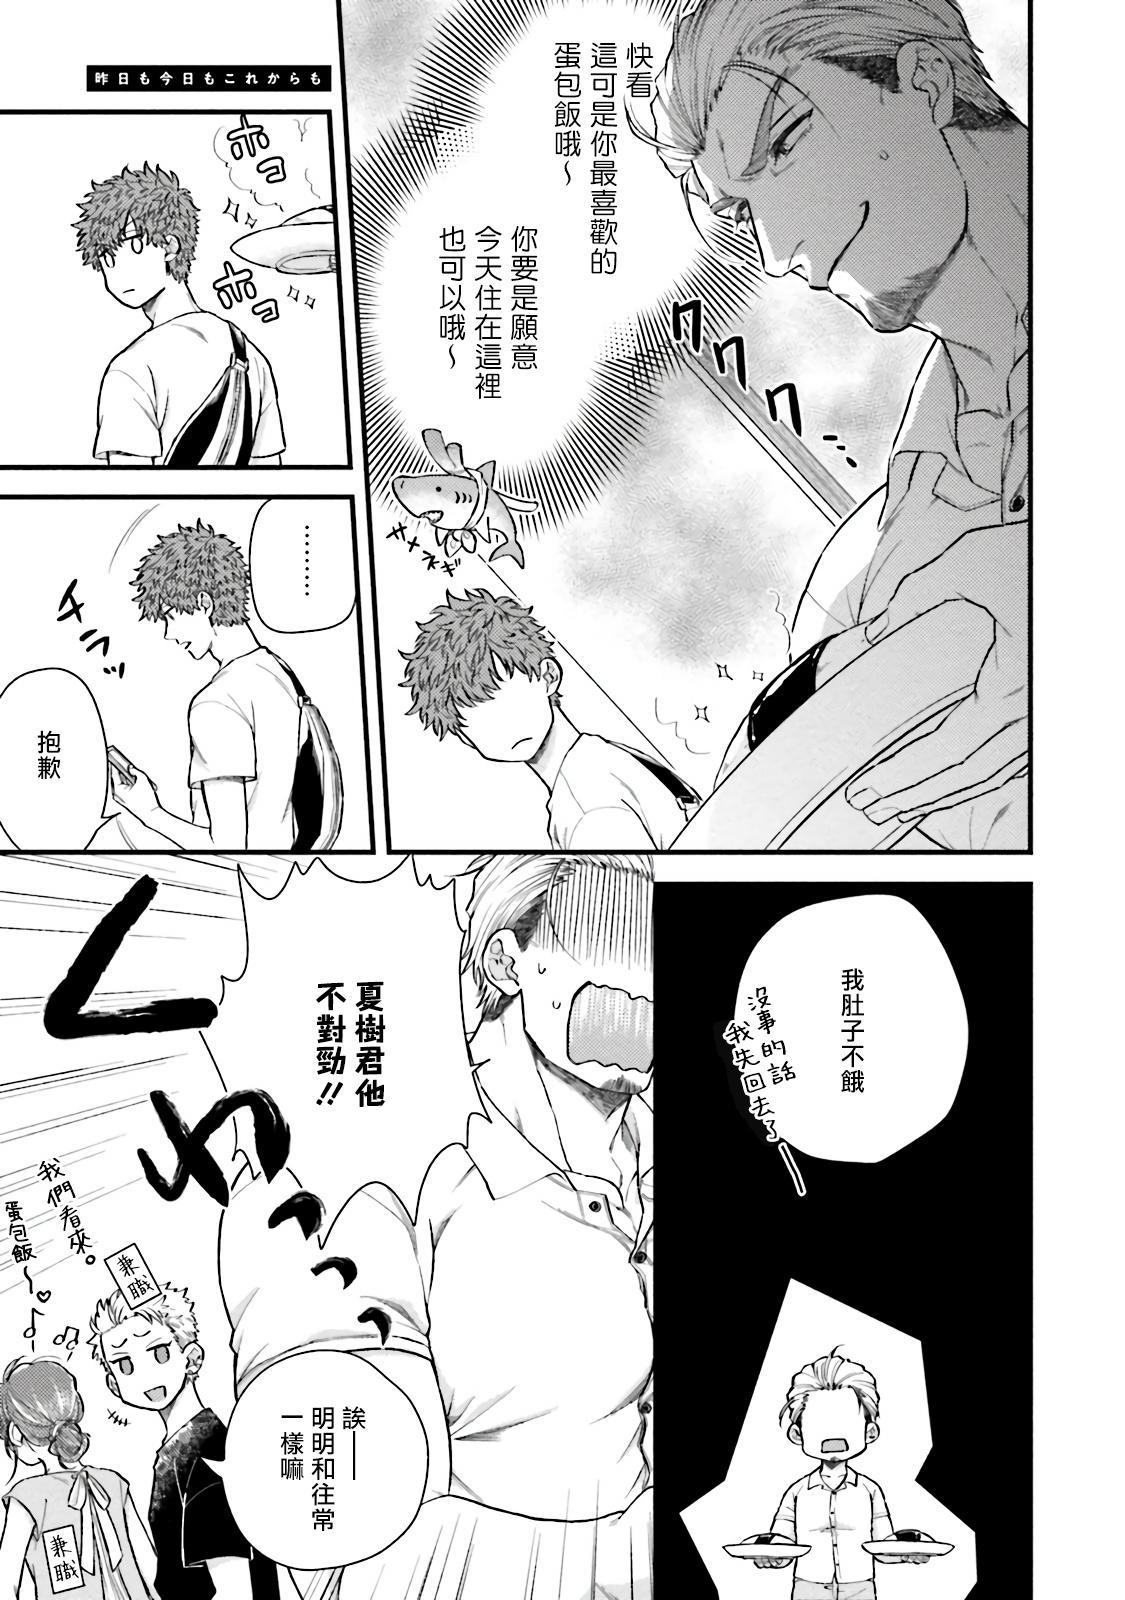 Kinou wa Otanoshimi Deshita ne | 昨天过得很愉快吧 Ch. 1-4+特典 59